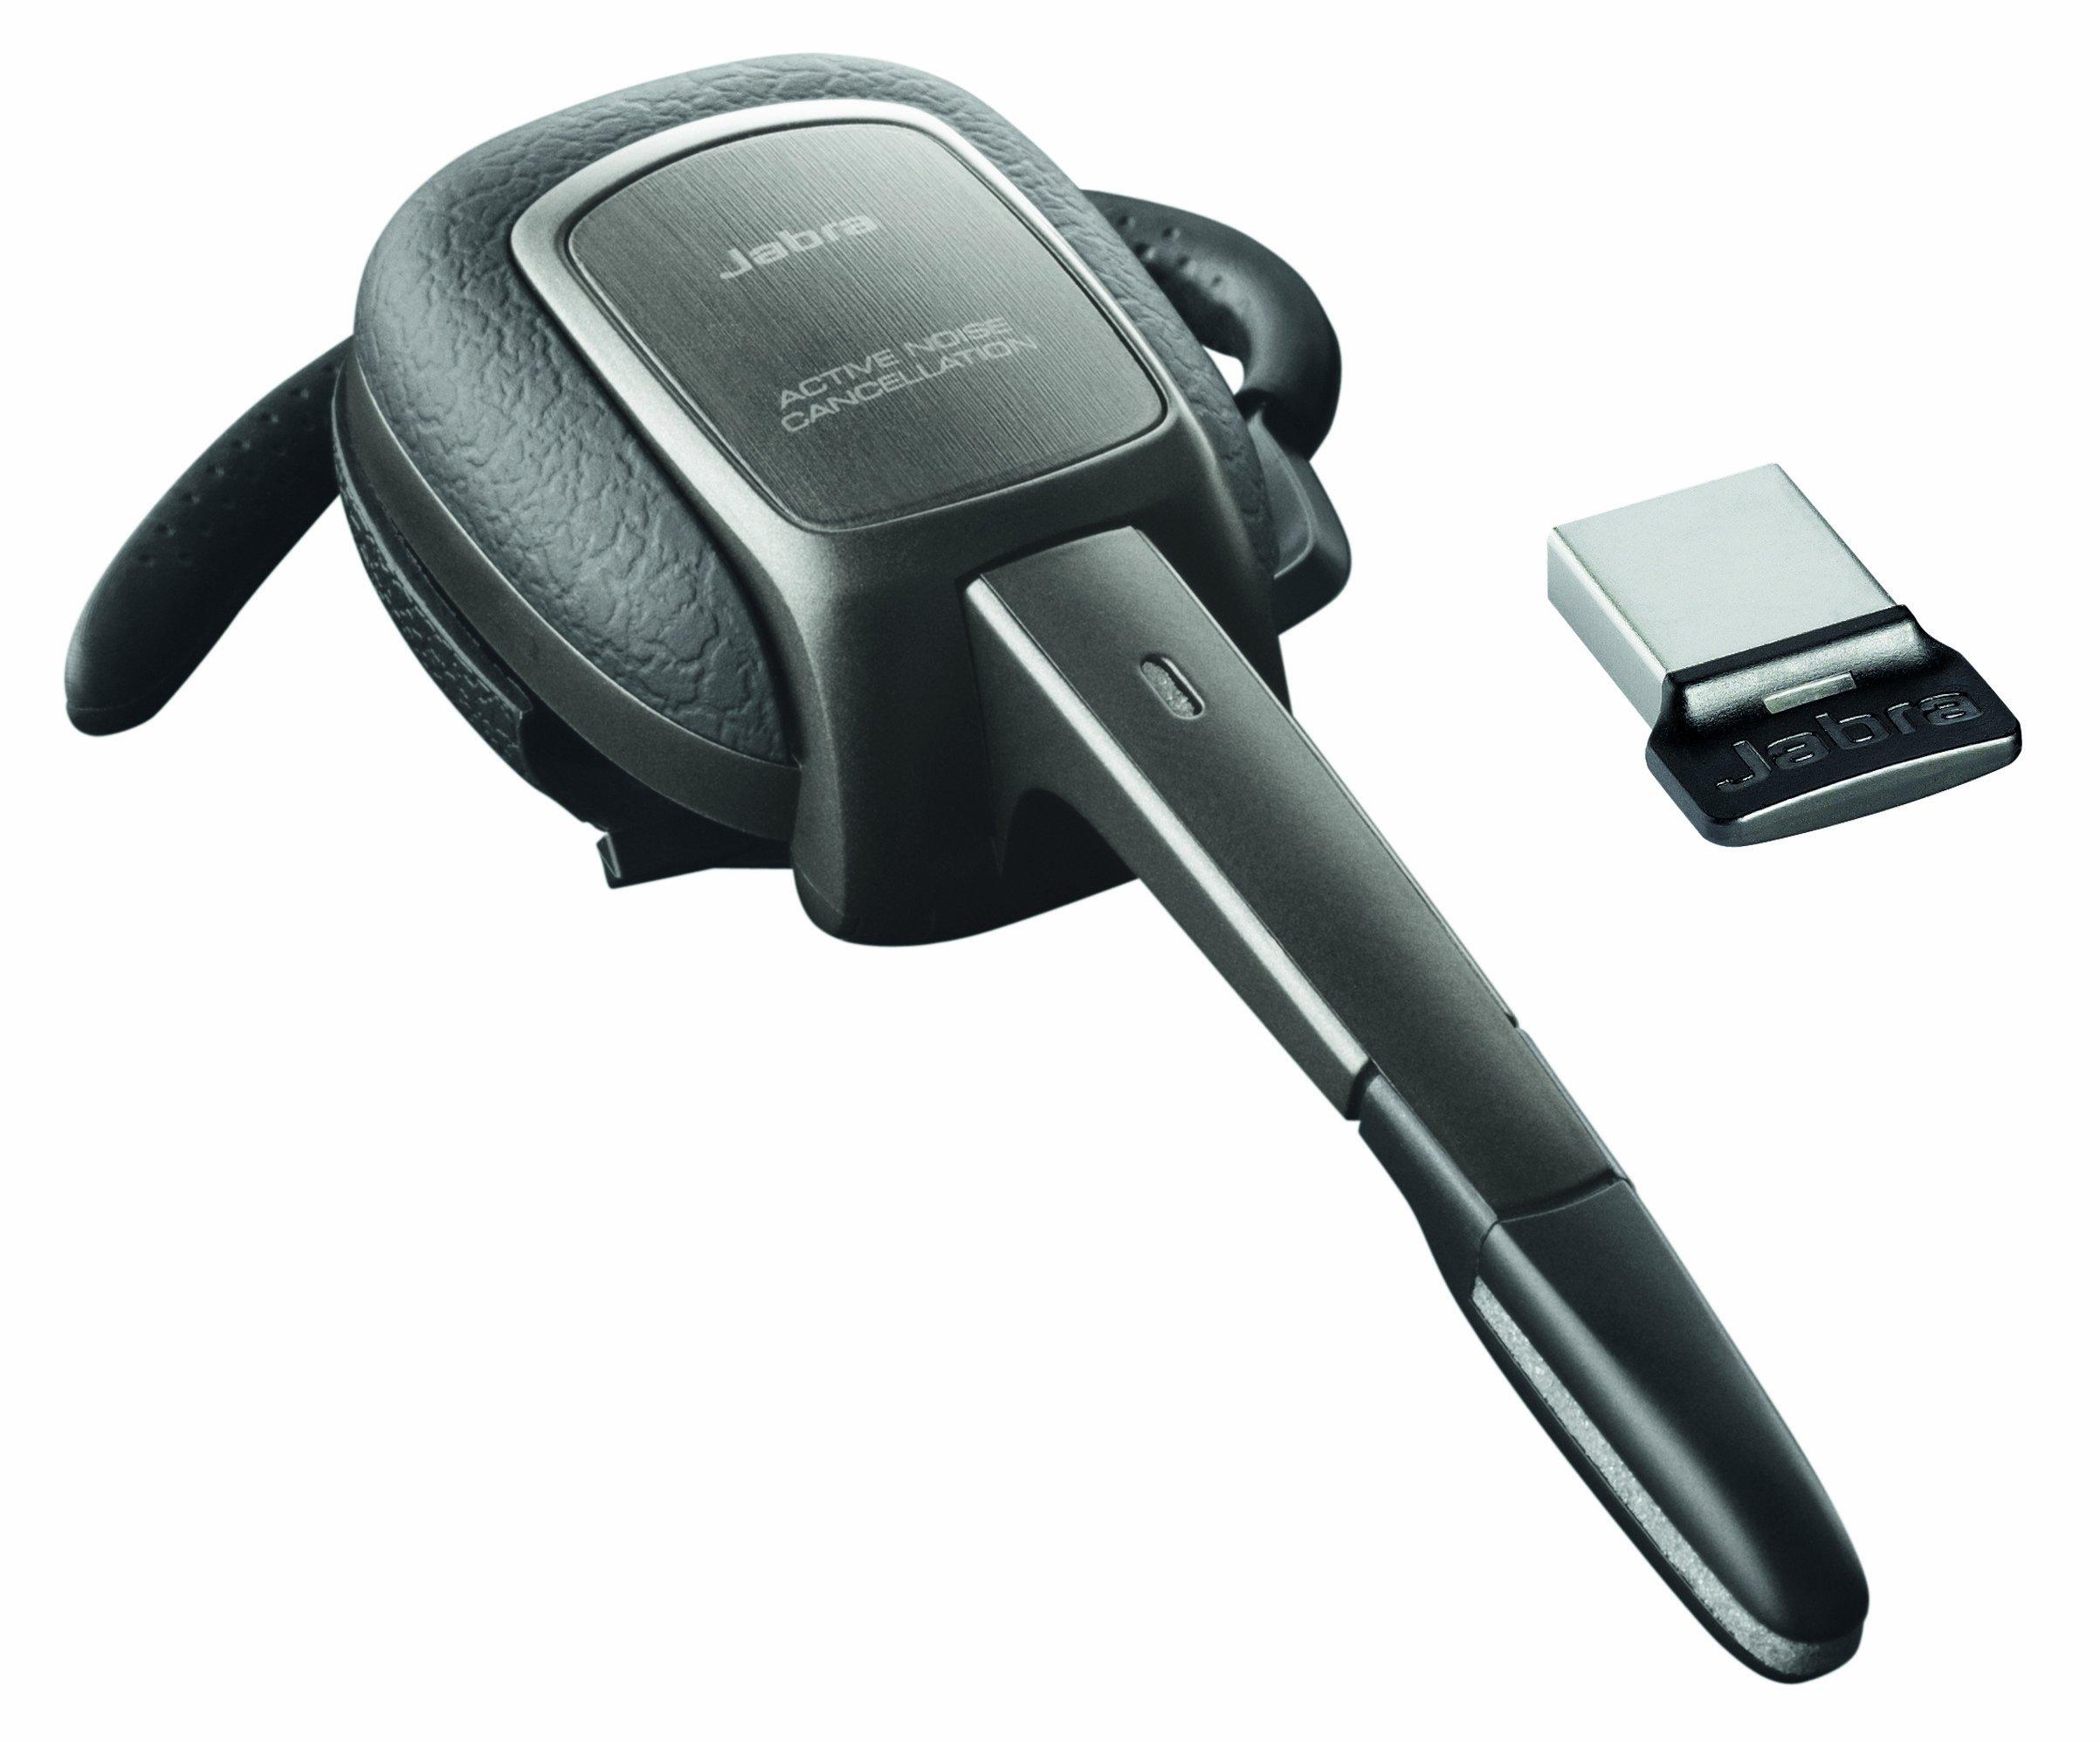 Global Martketing 5078-230-405 Jabra SUPREME UC MS Headset by Global Martketing